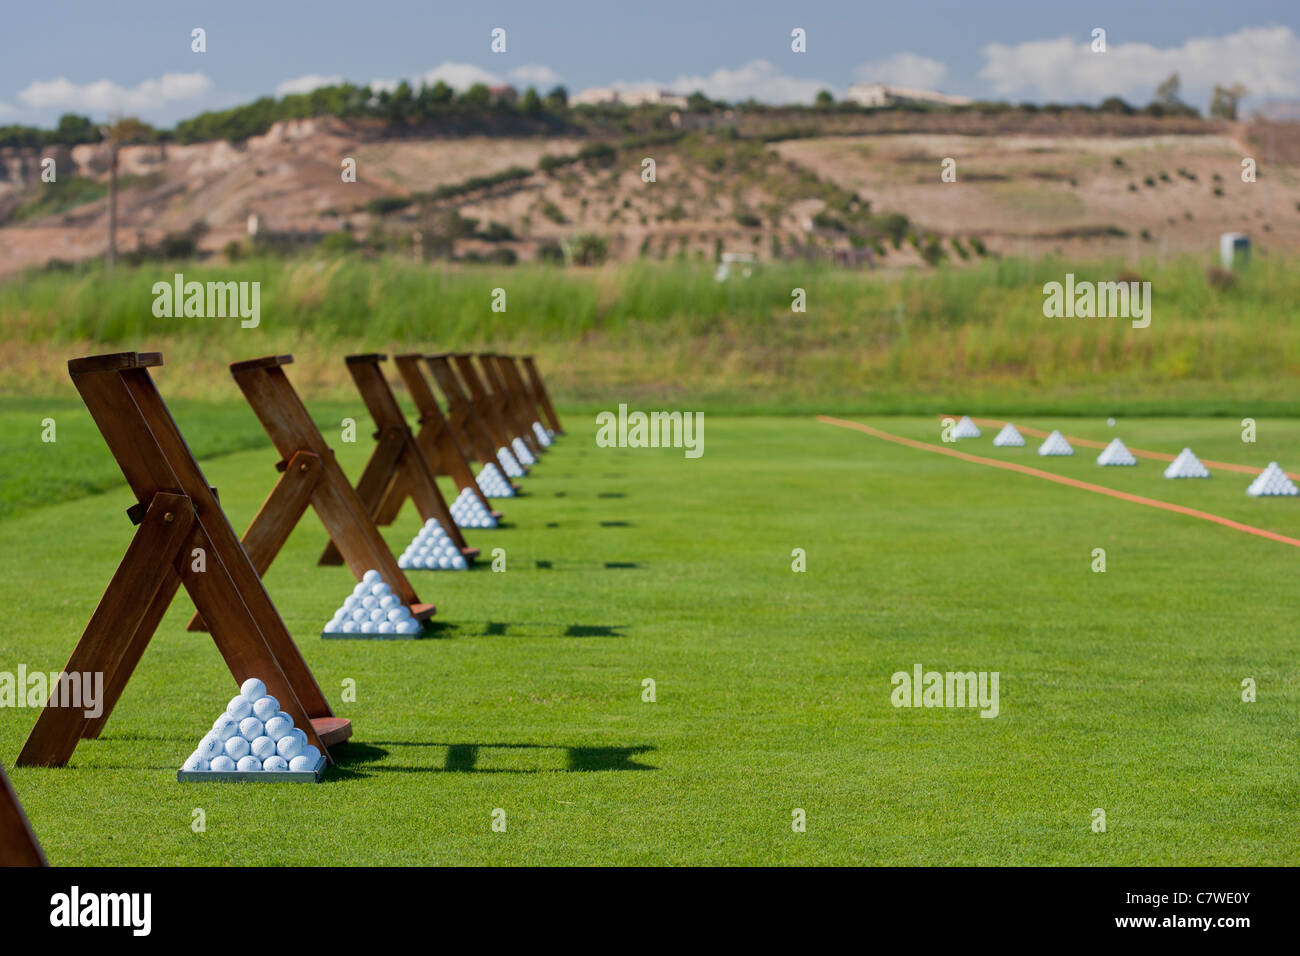 Pyramids of golf balls at a Golf driving practice range Stock Photo